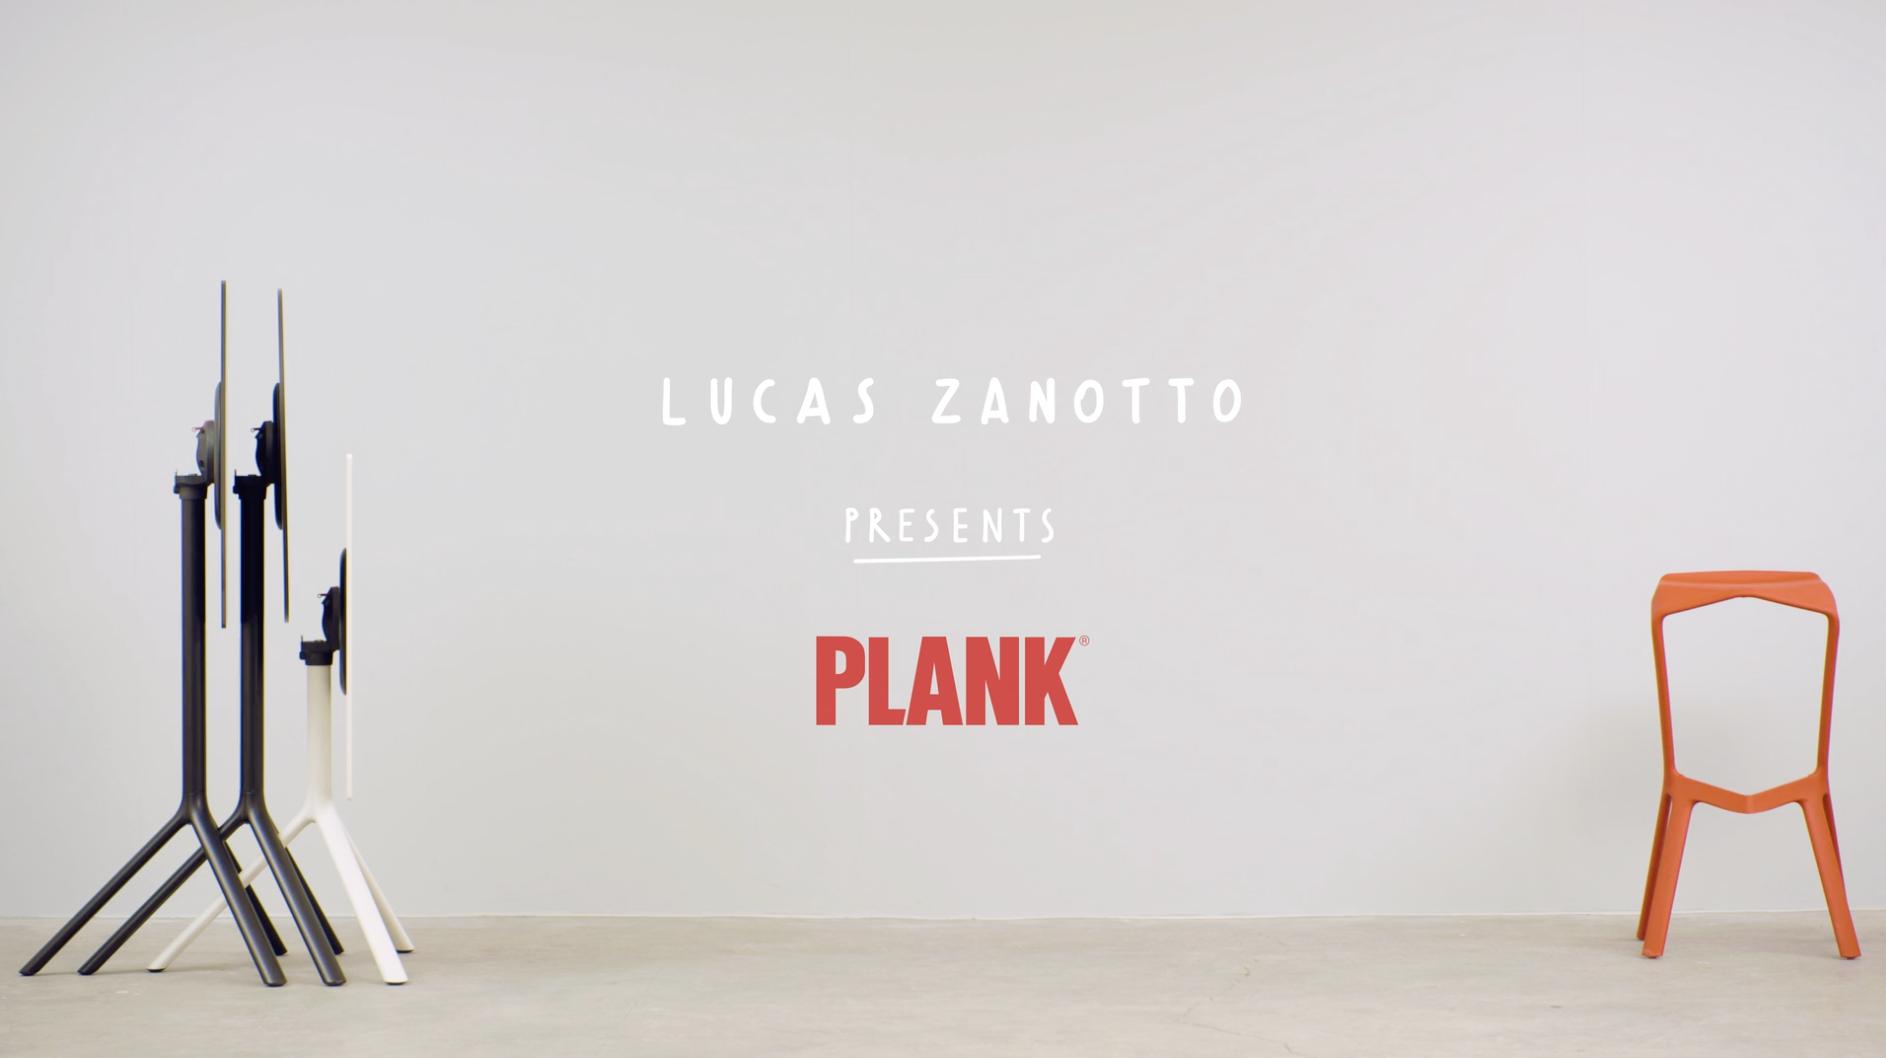 PLANK   Lucas Zanotto